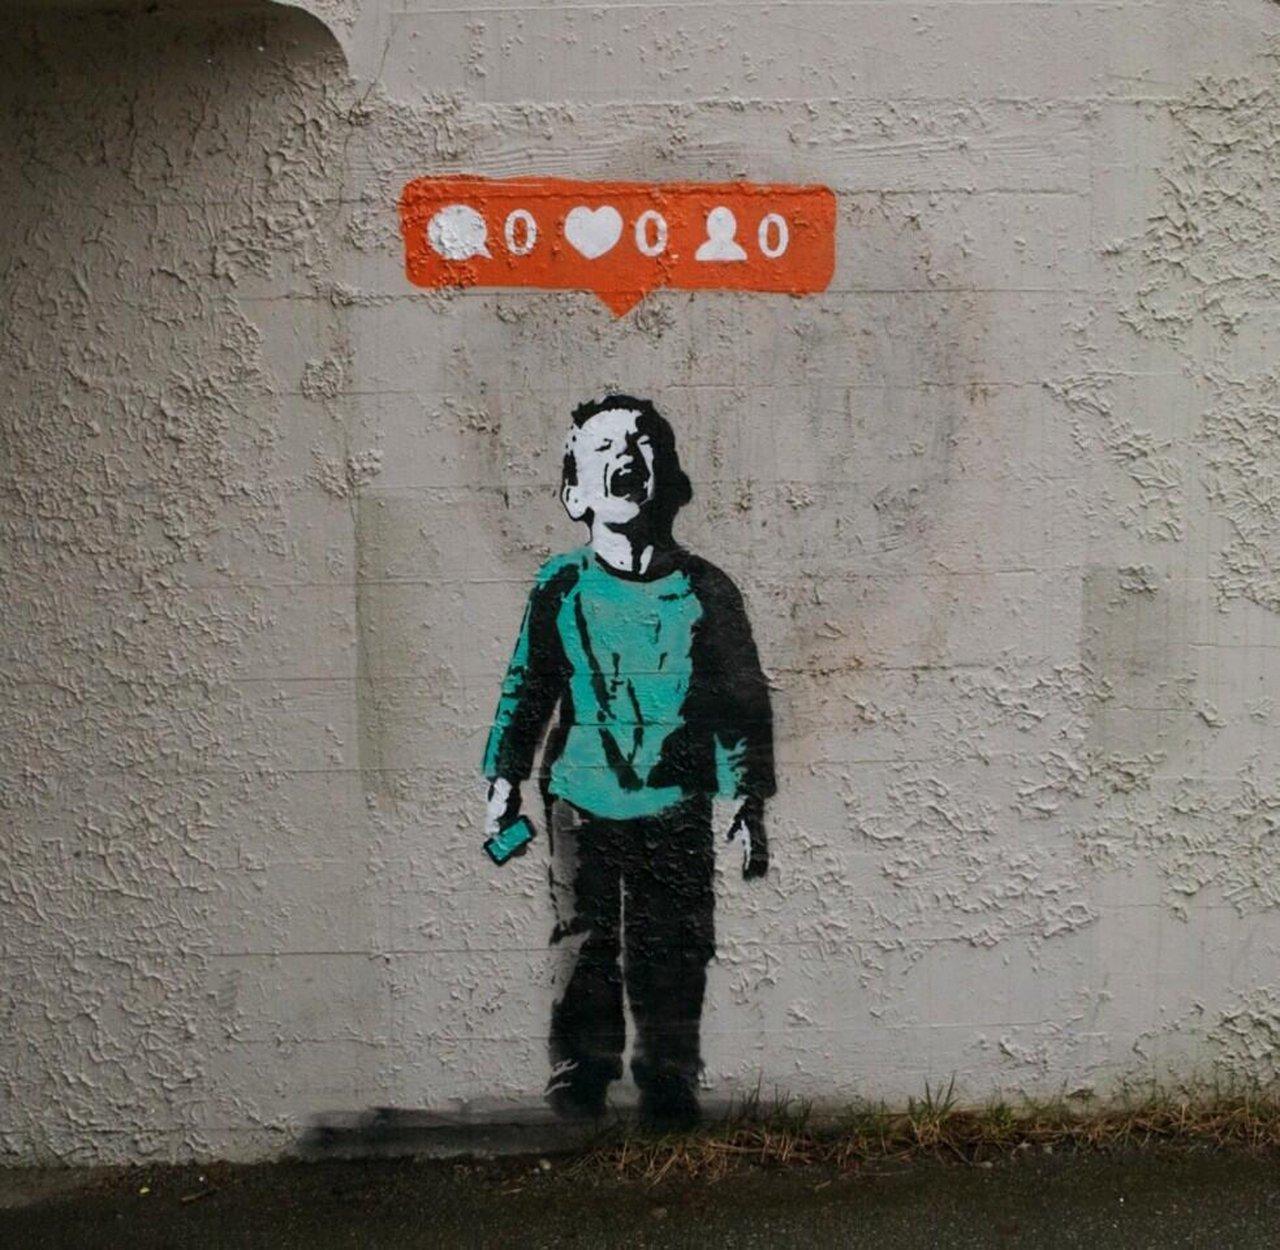 Street art #12 28